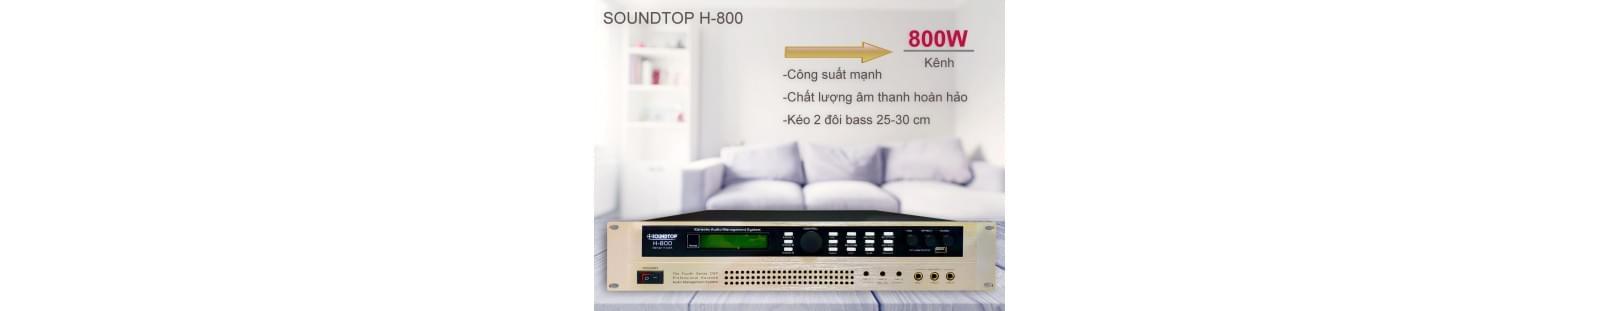 SoundTop H-800